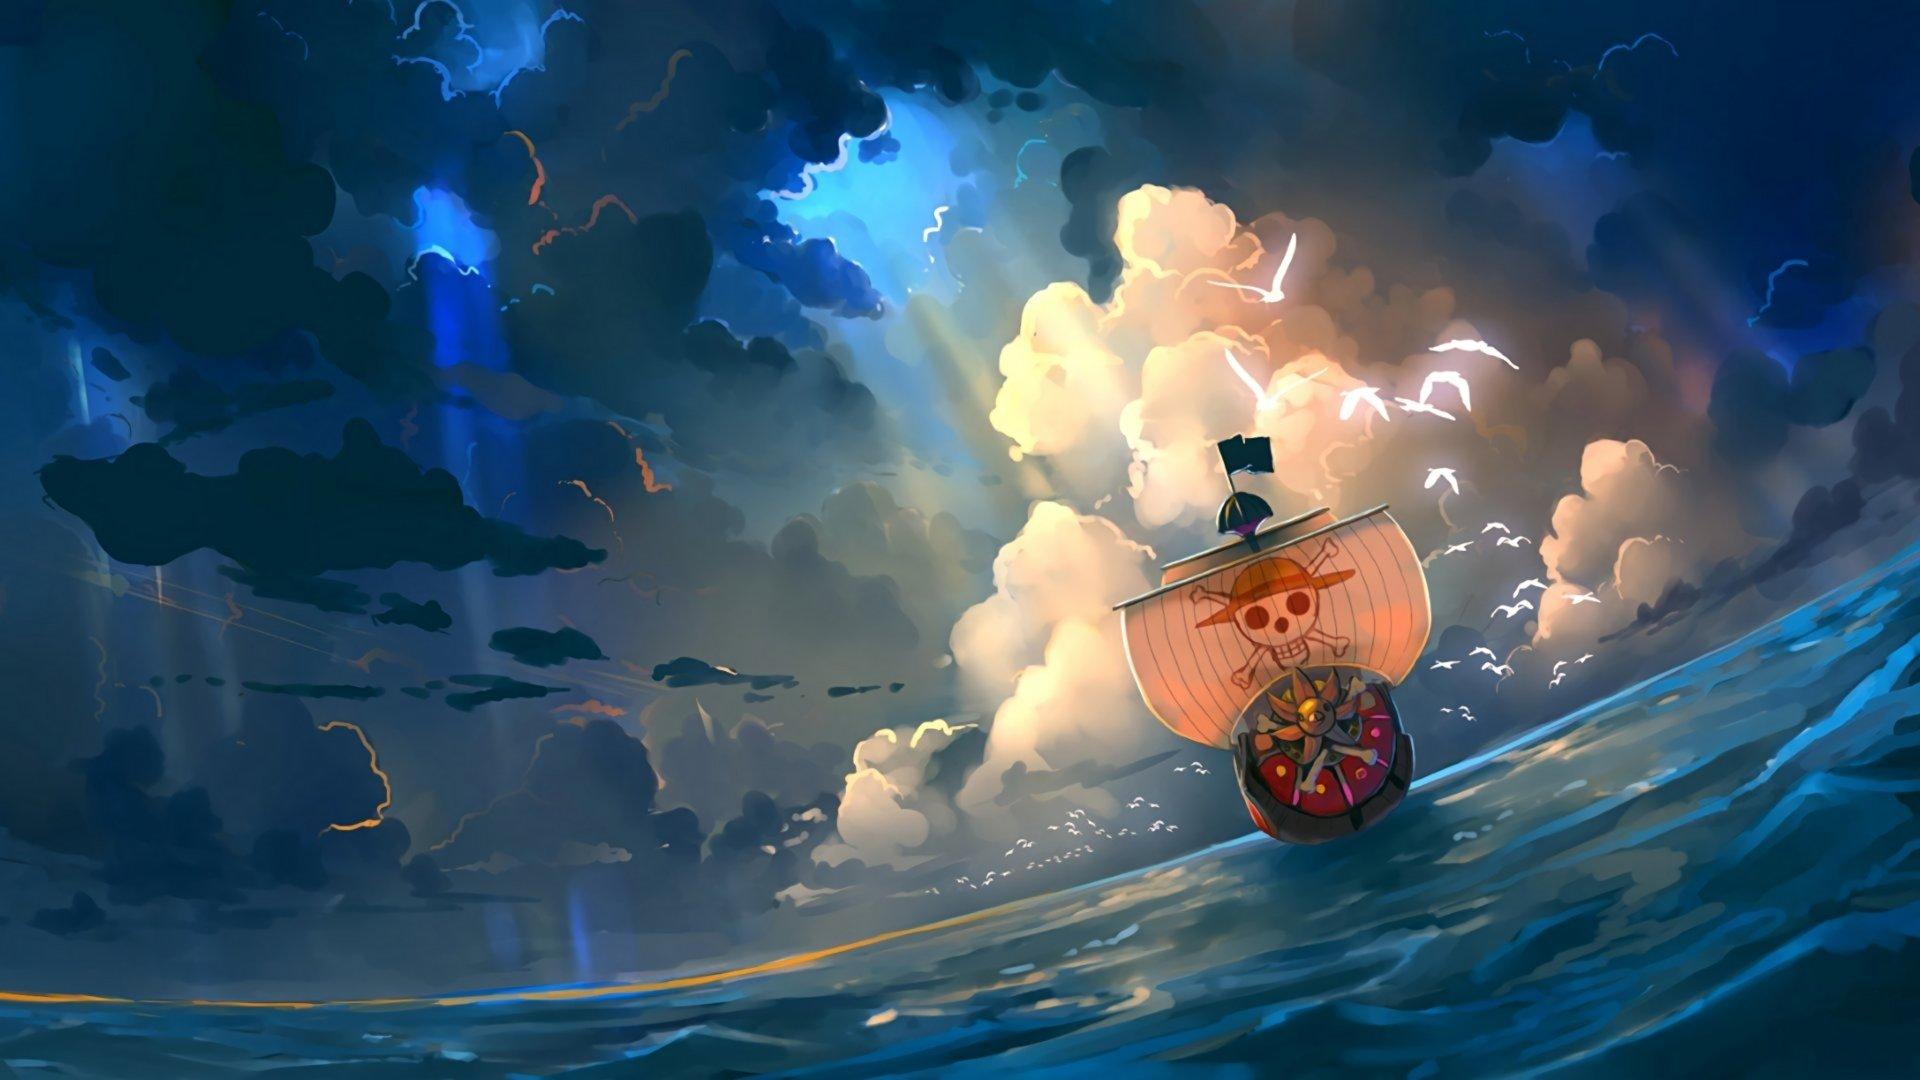 One Piece Artwork Anime Wallpaper 4k Ultra Hd Id4011